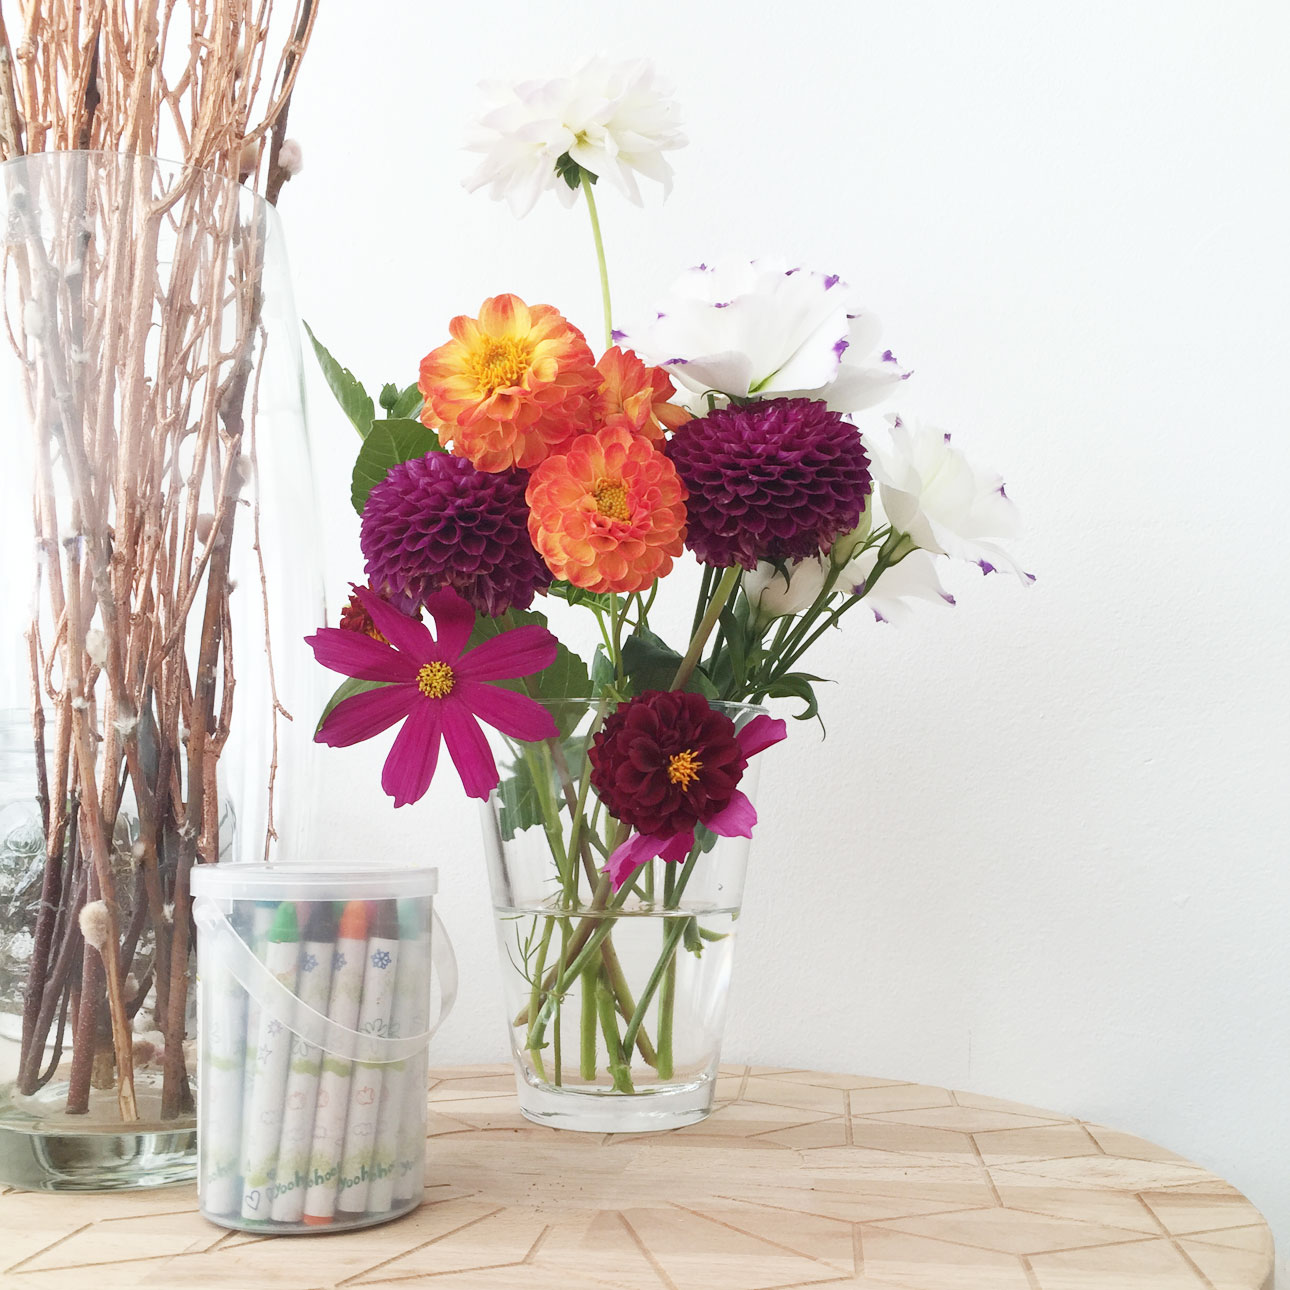 mamalifestyle september 2016 bloemen